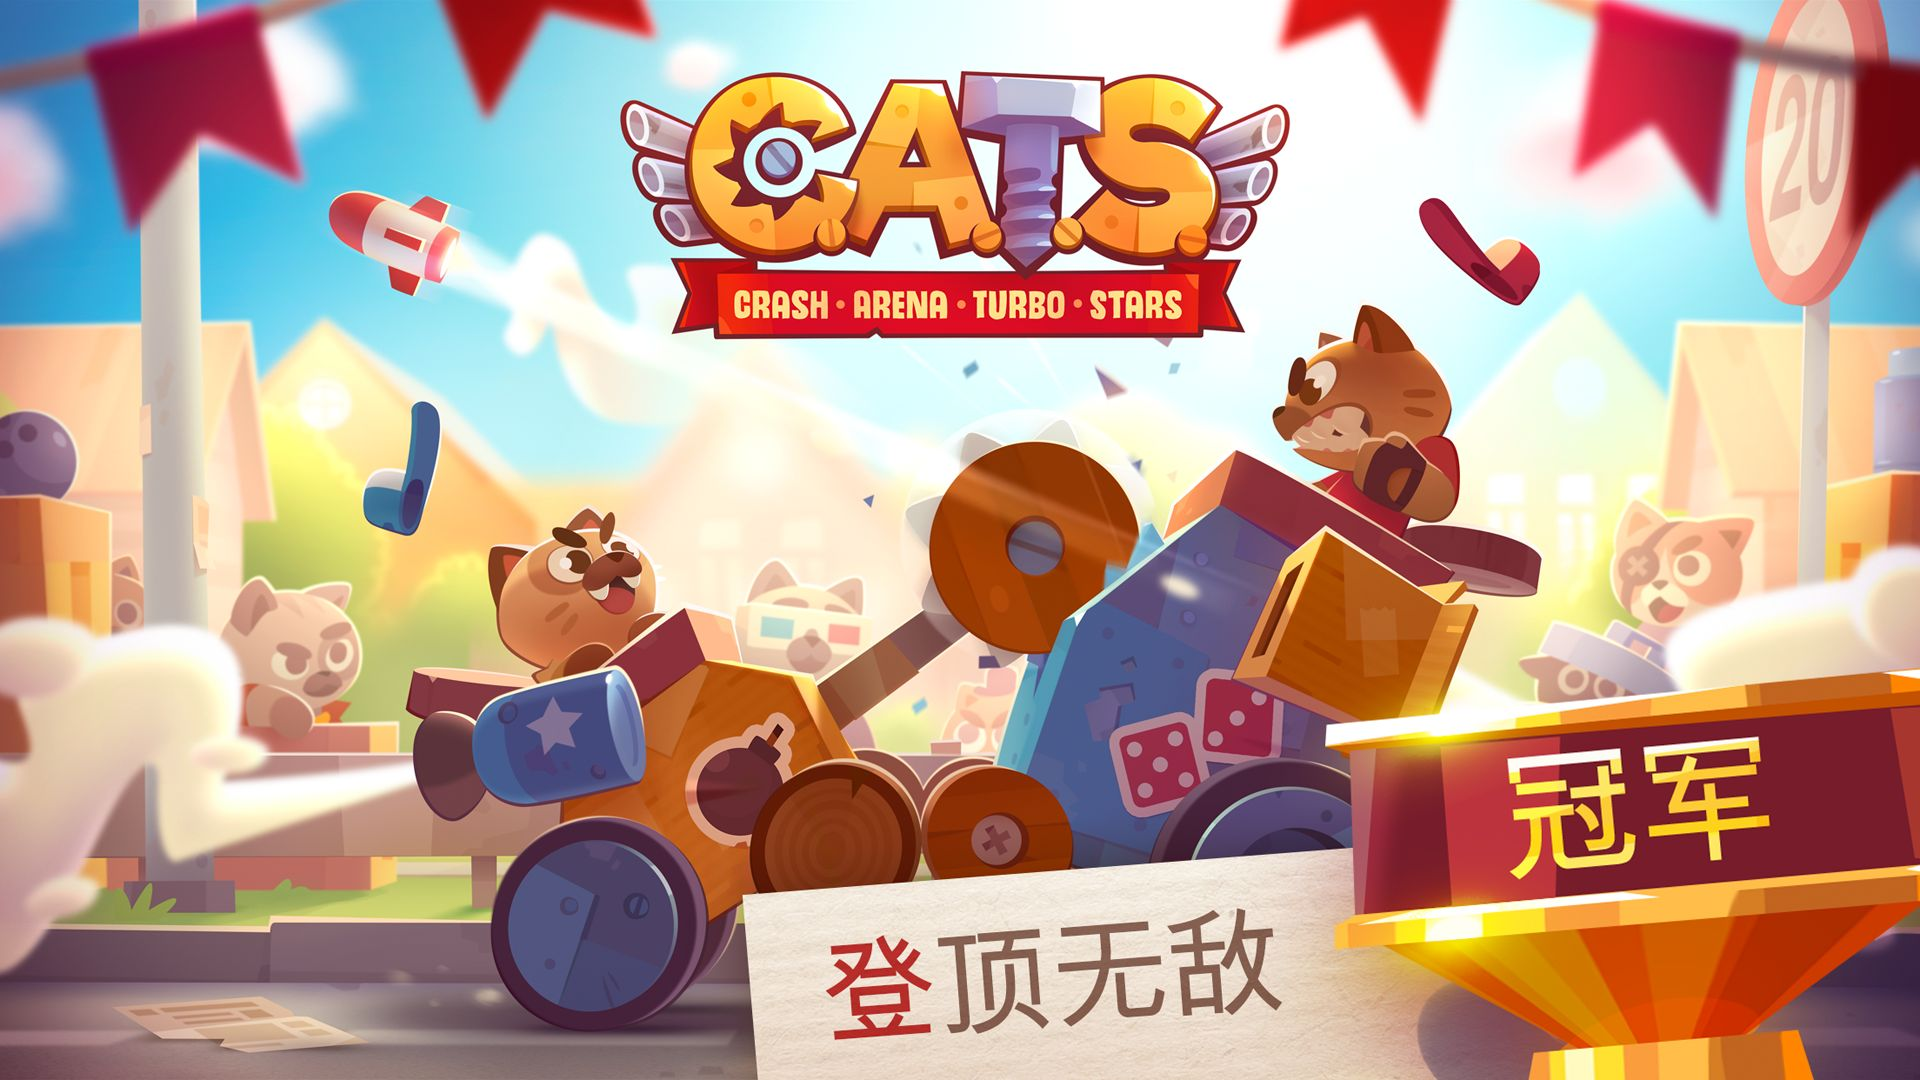 CATS: Crash Arena Turbo Stars 游戏截图5